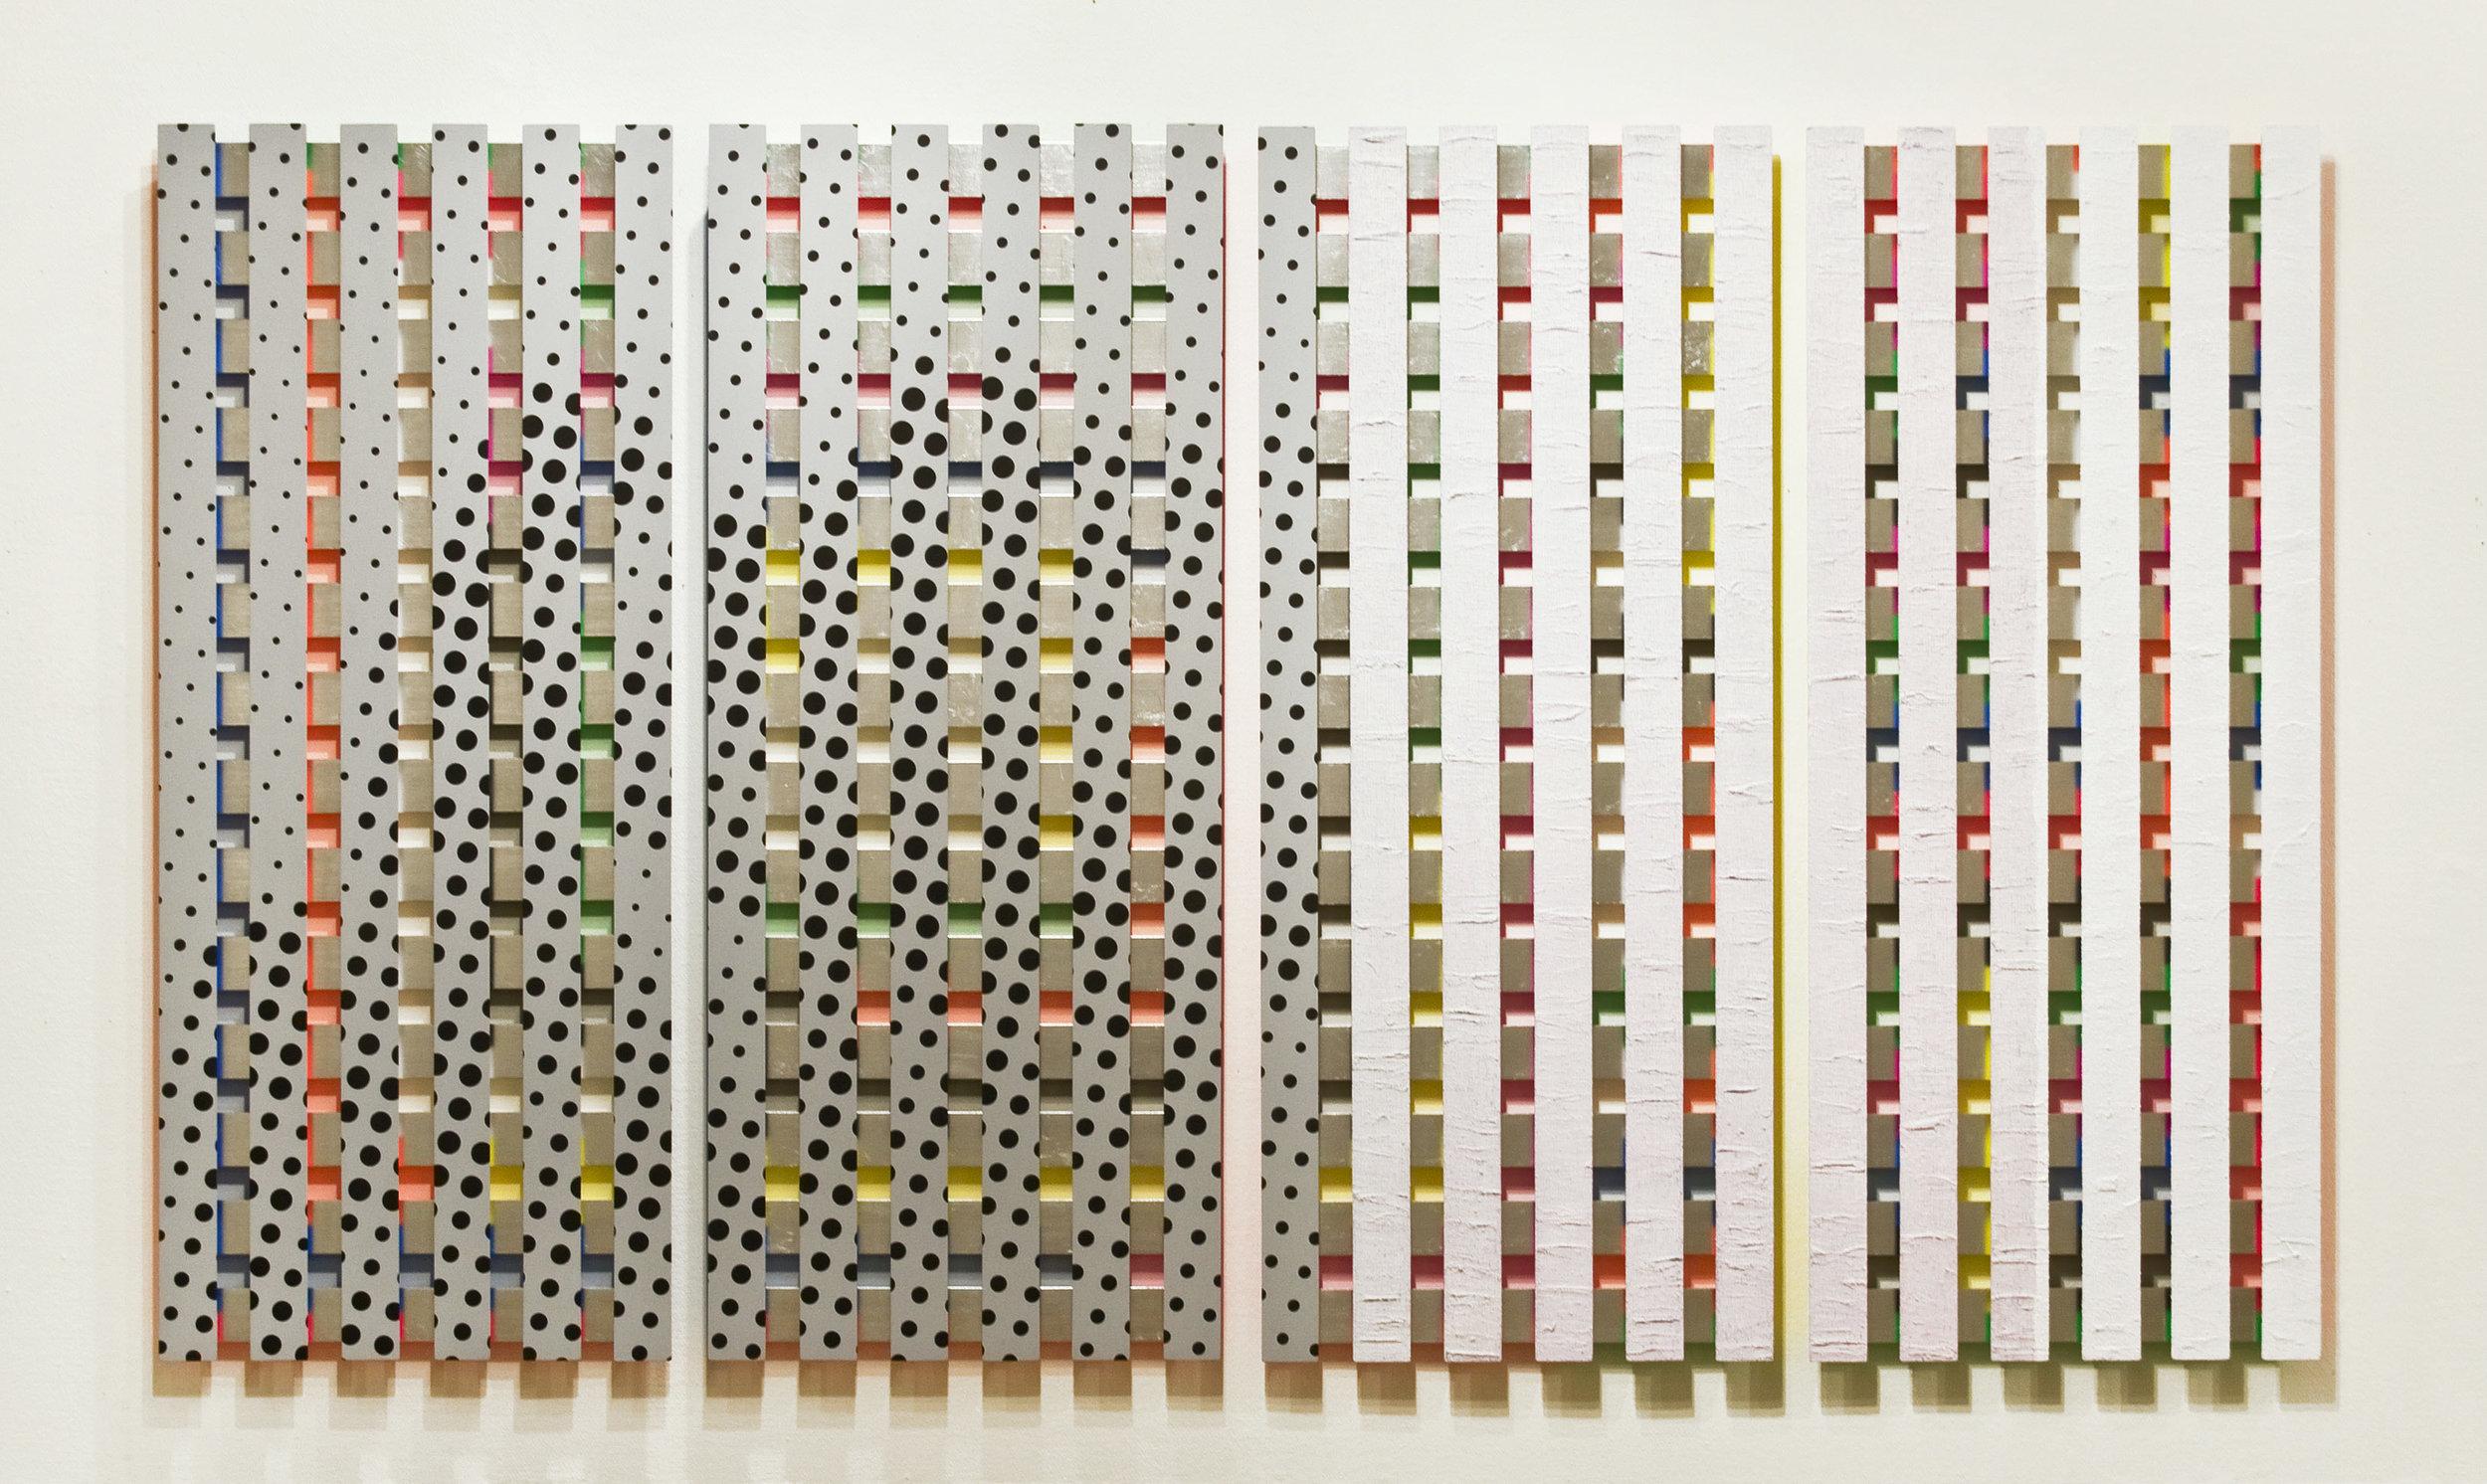 3i akril, les, 186 x 335 cm, 2010.jpg